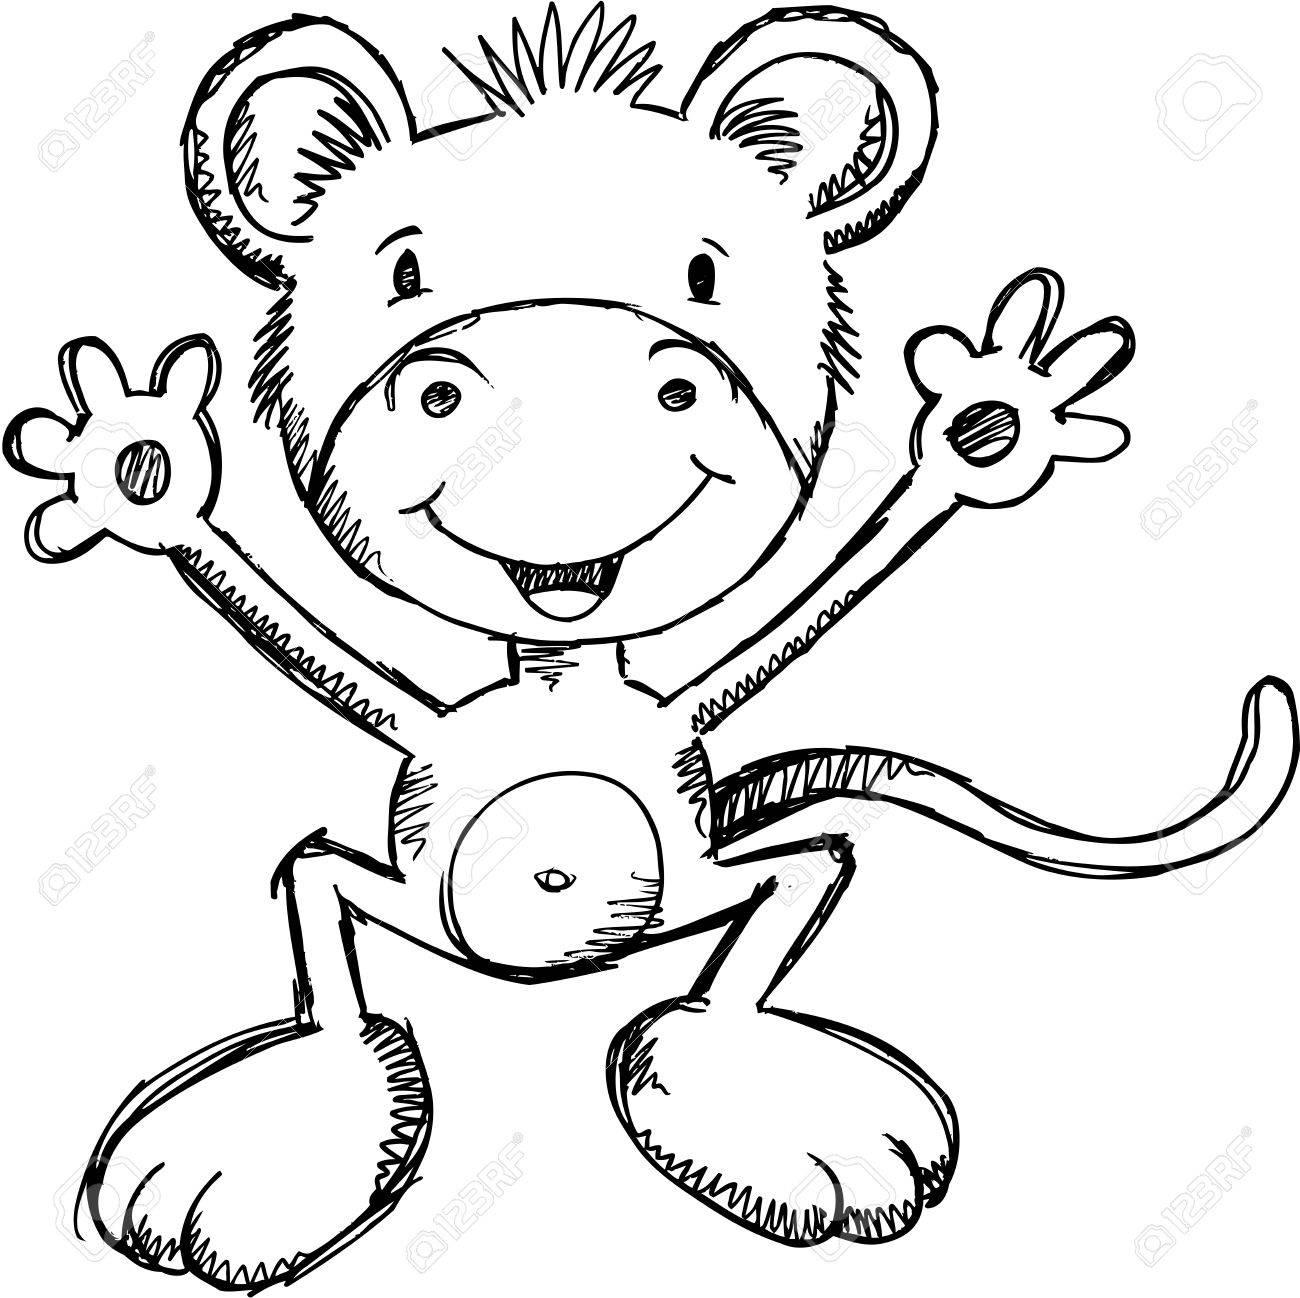 1300x1298 Cute Sketch Monkey Vector Illustration Art Royalty Free Cliparts